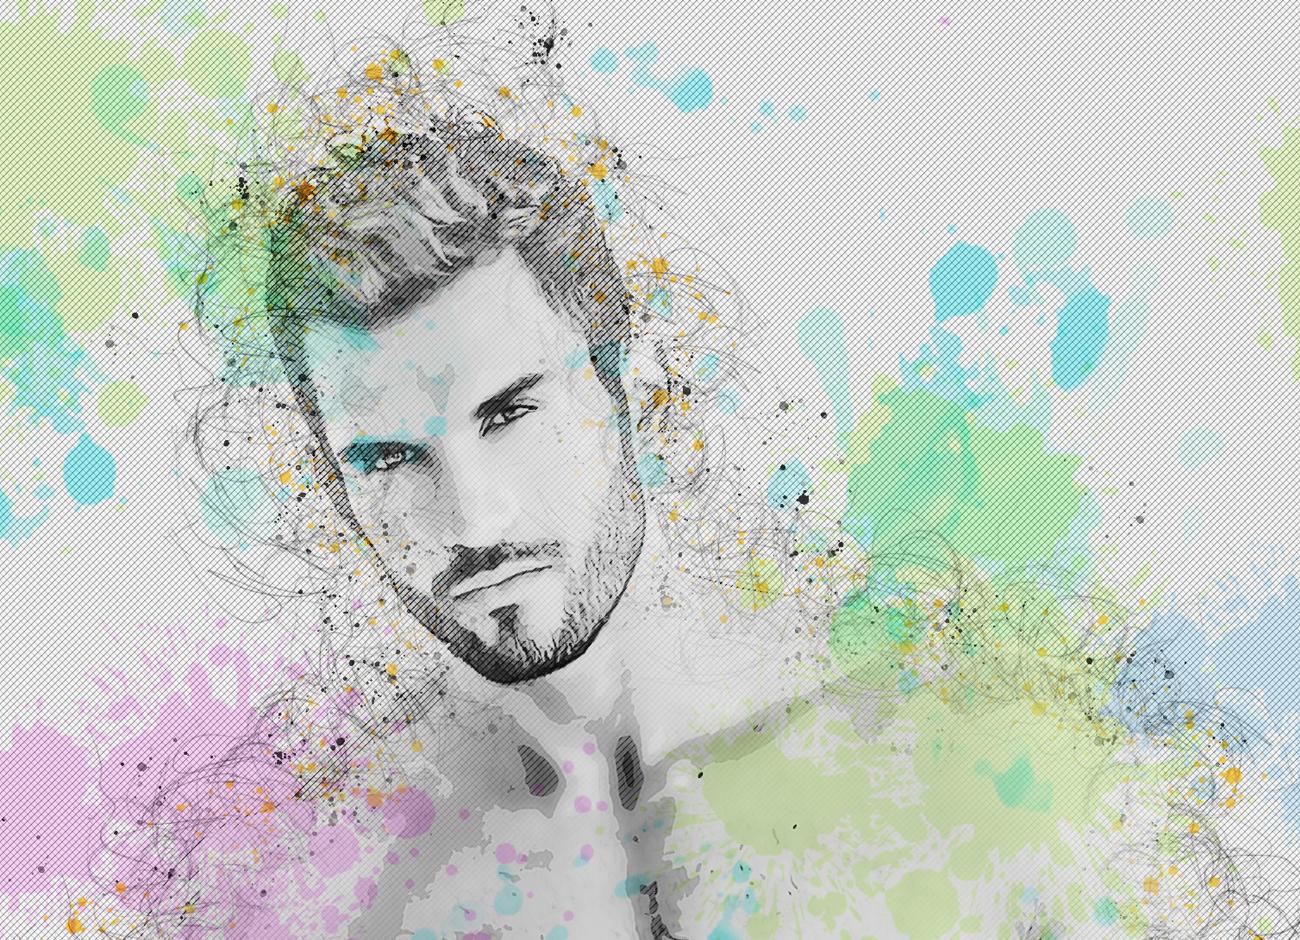 抽象铅笔素描效果照片处理特效PS动作模板 Abstract Sketch Photoshop Action插图4